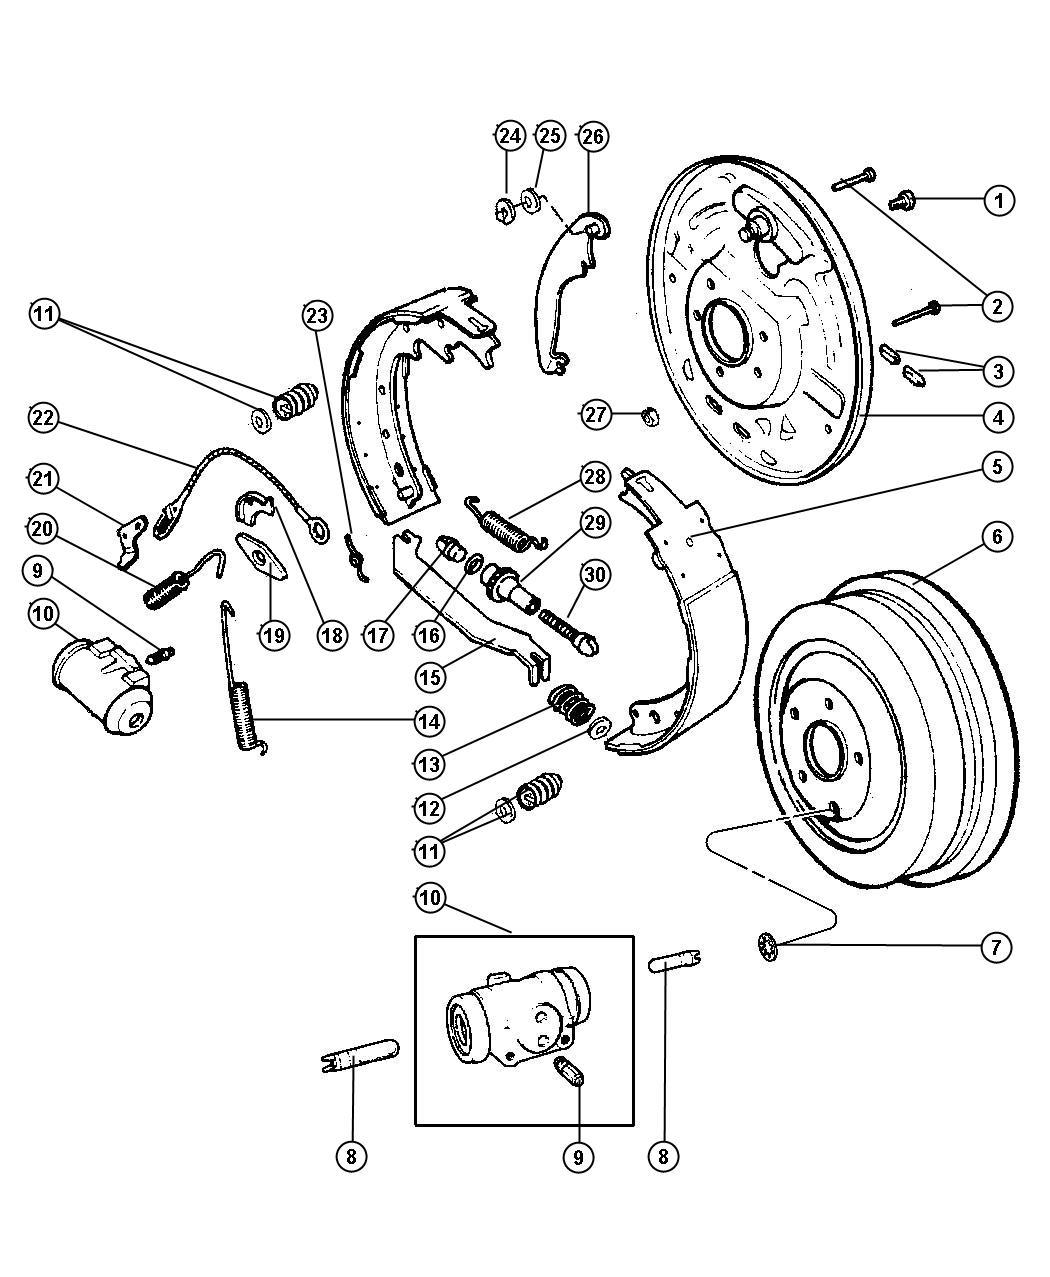 2007 Chrysler PT Cruiser Drum. Brake. Axle, rear, ratio